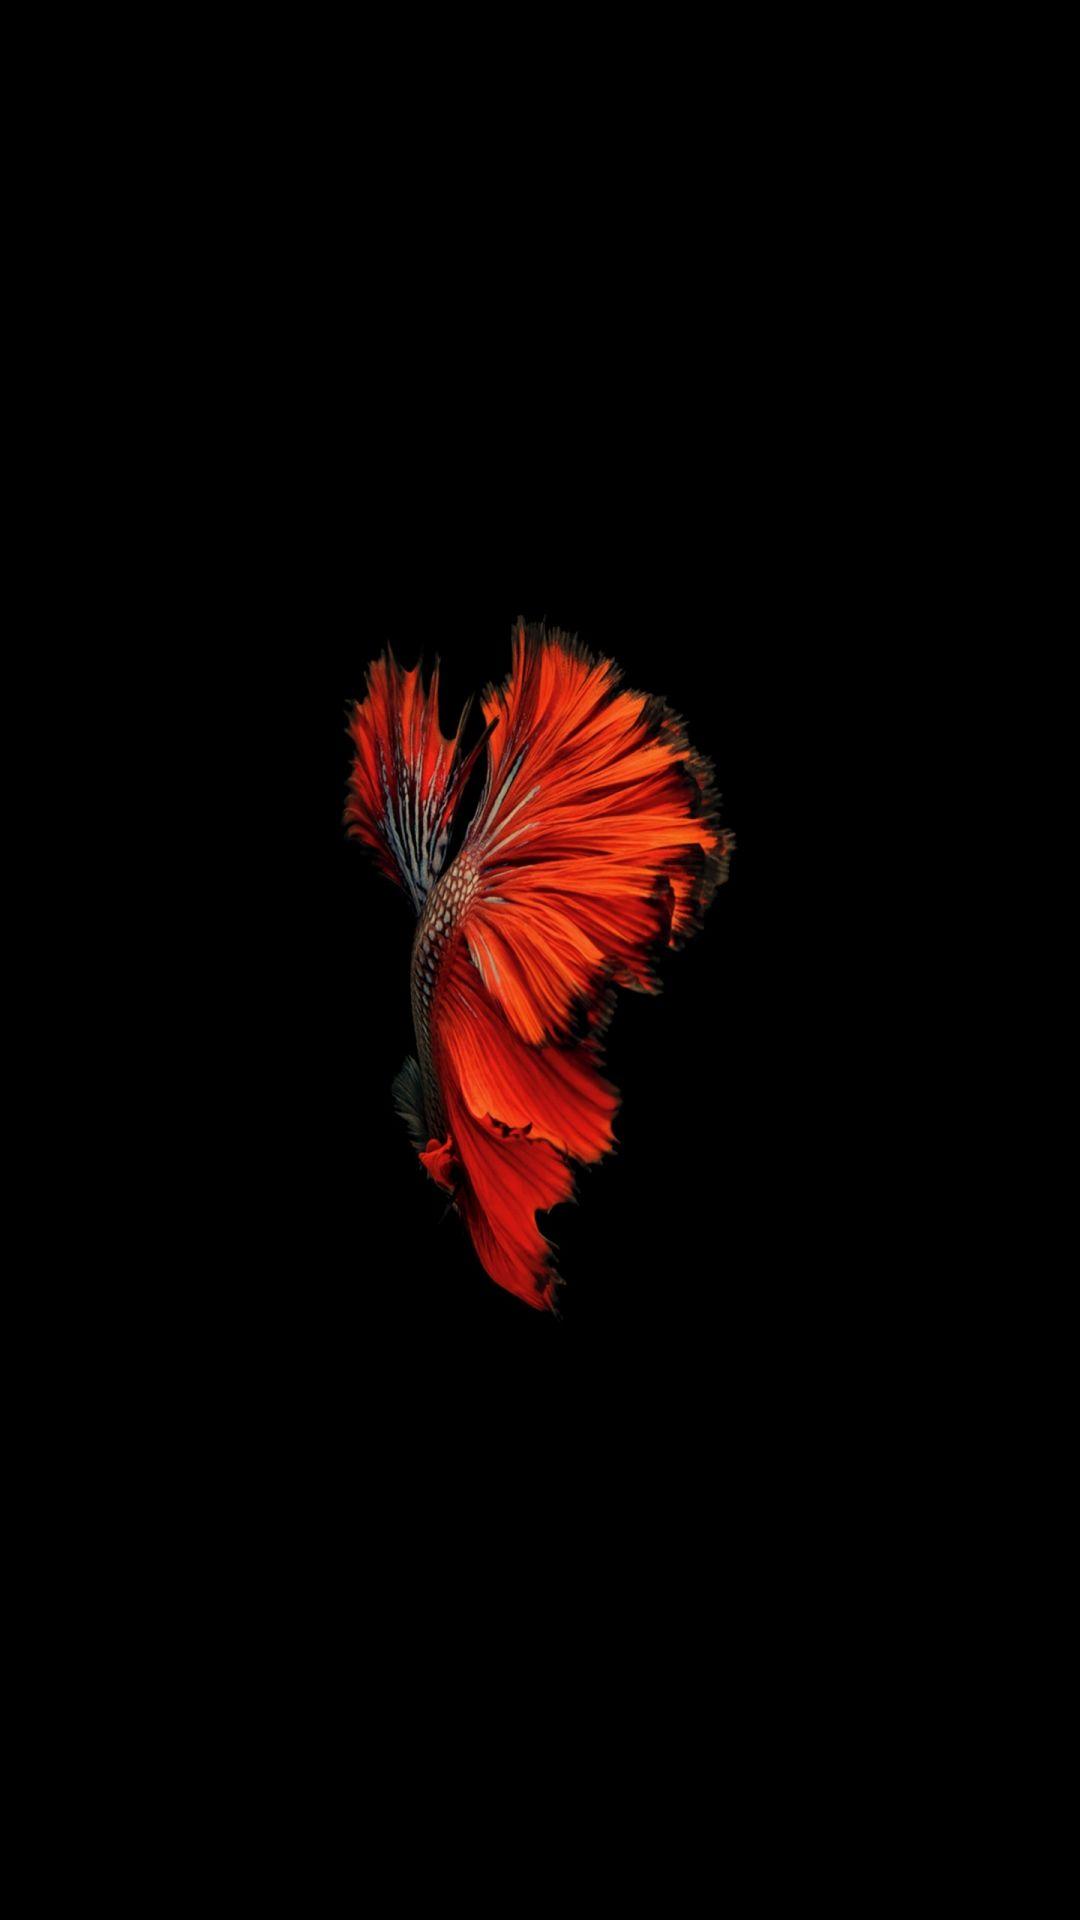 Fish Clean wallpaper 1080x1920